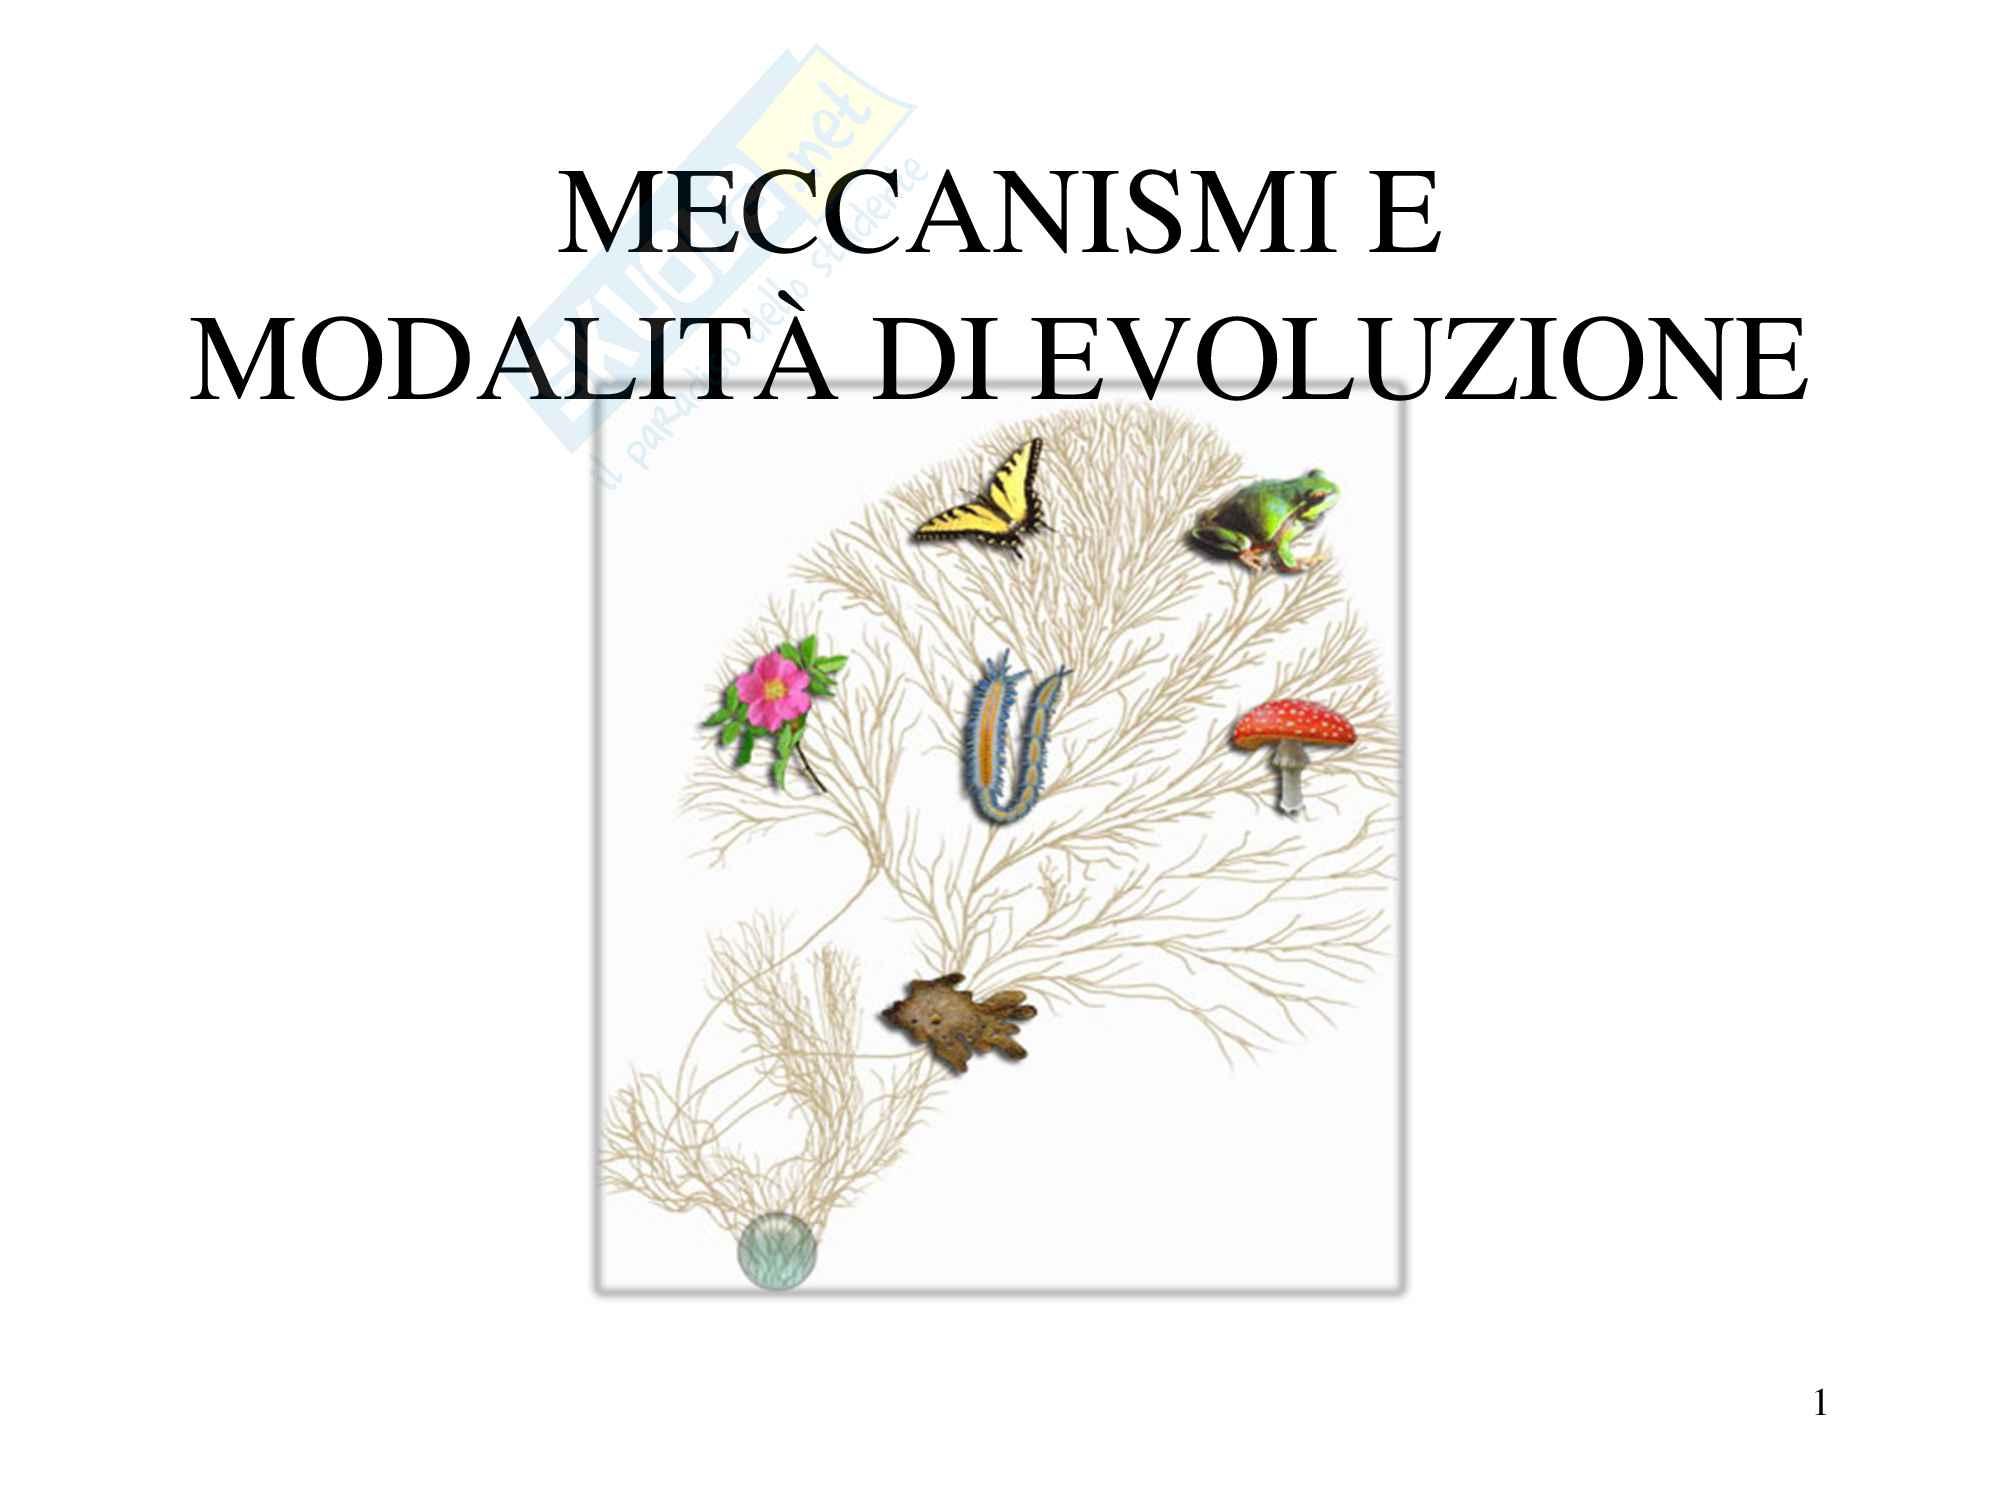 Zoologia meccanismi e modalità di evoluzione, scienze biologiche